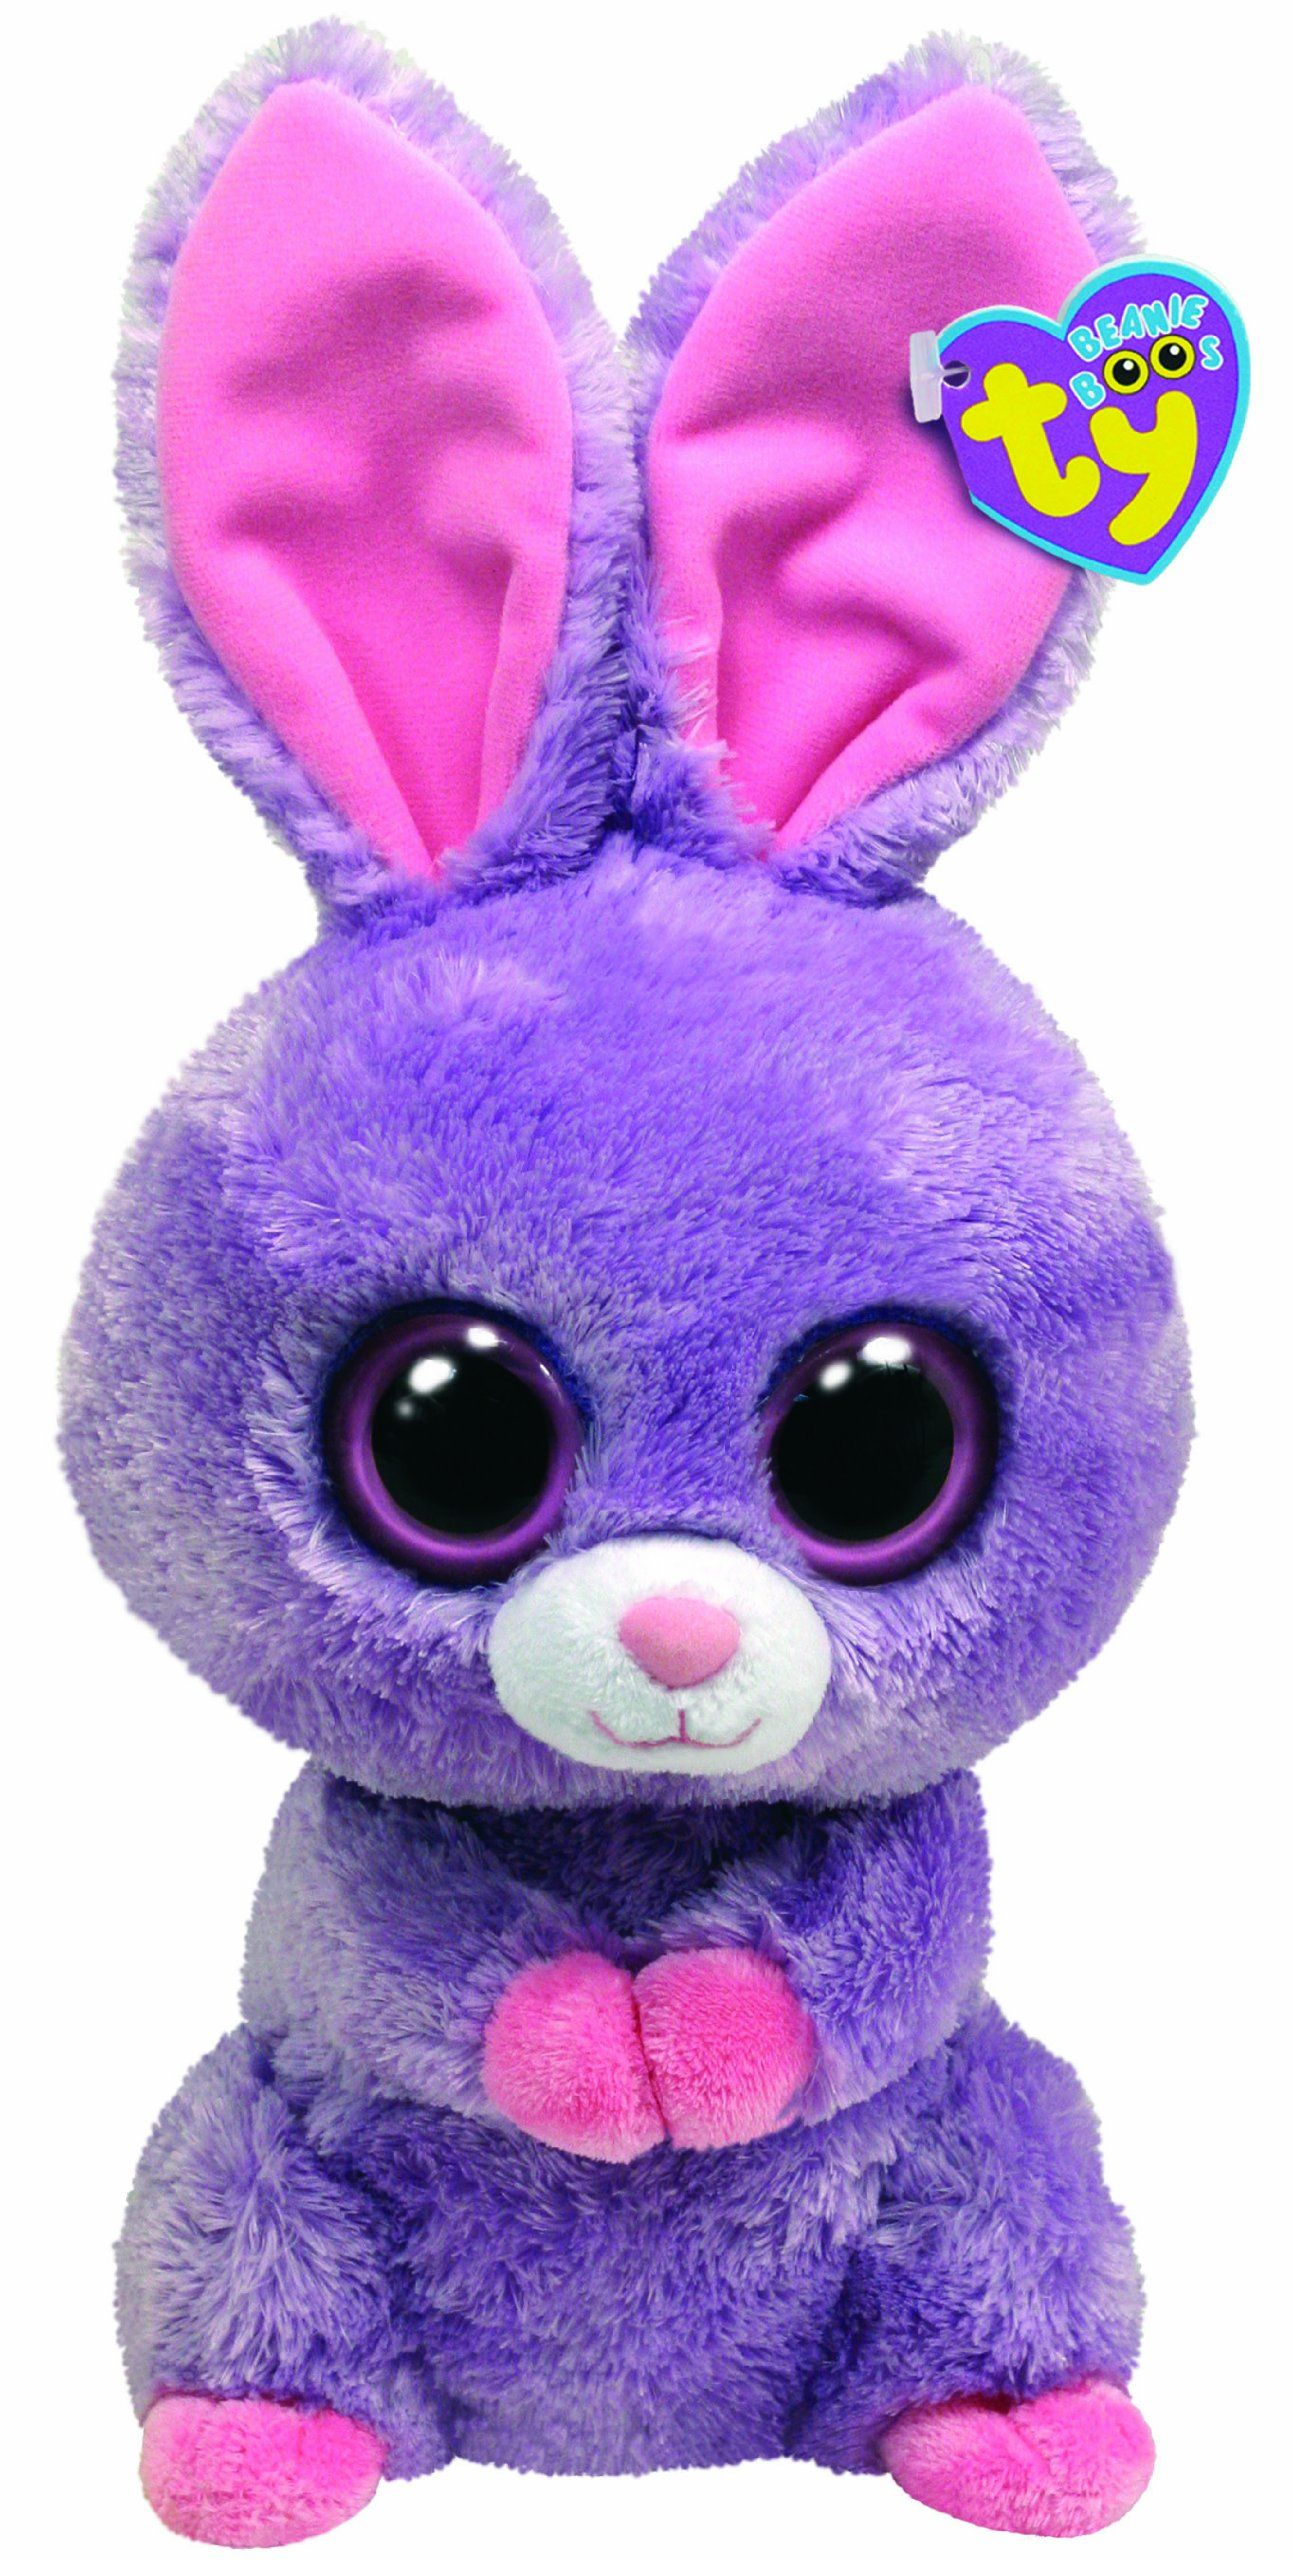 c3c2023a5cf Ty Beanie Boos Buddies Petunia Purple Bunny